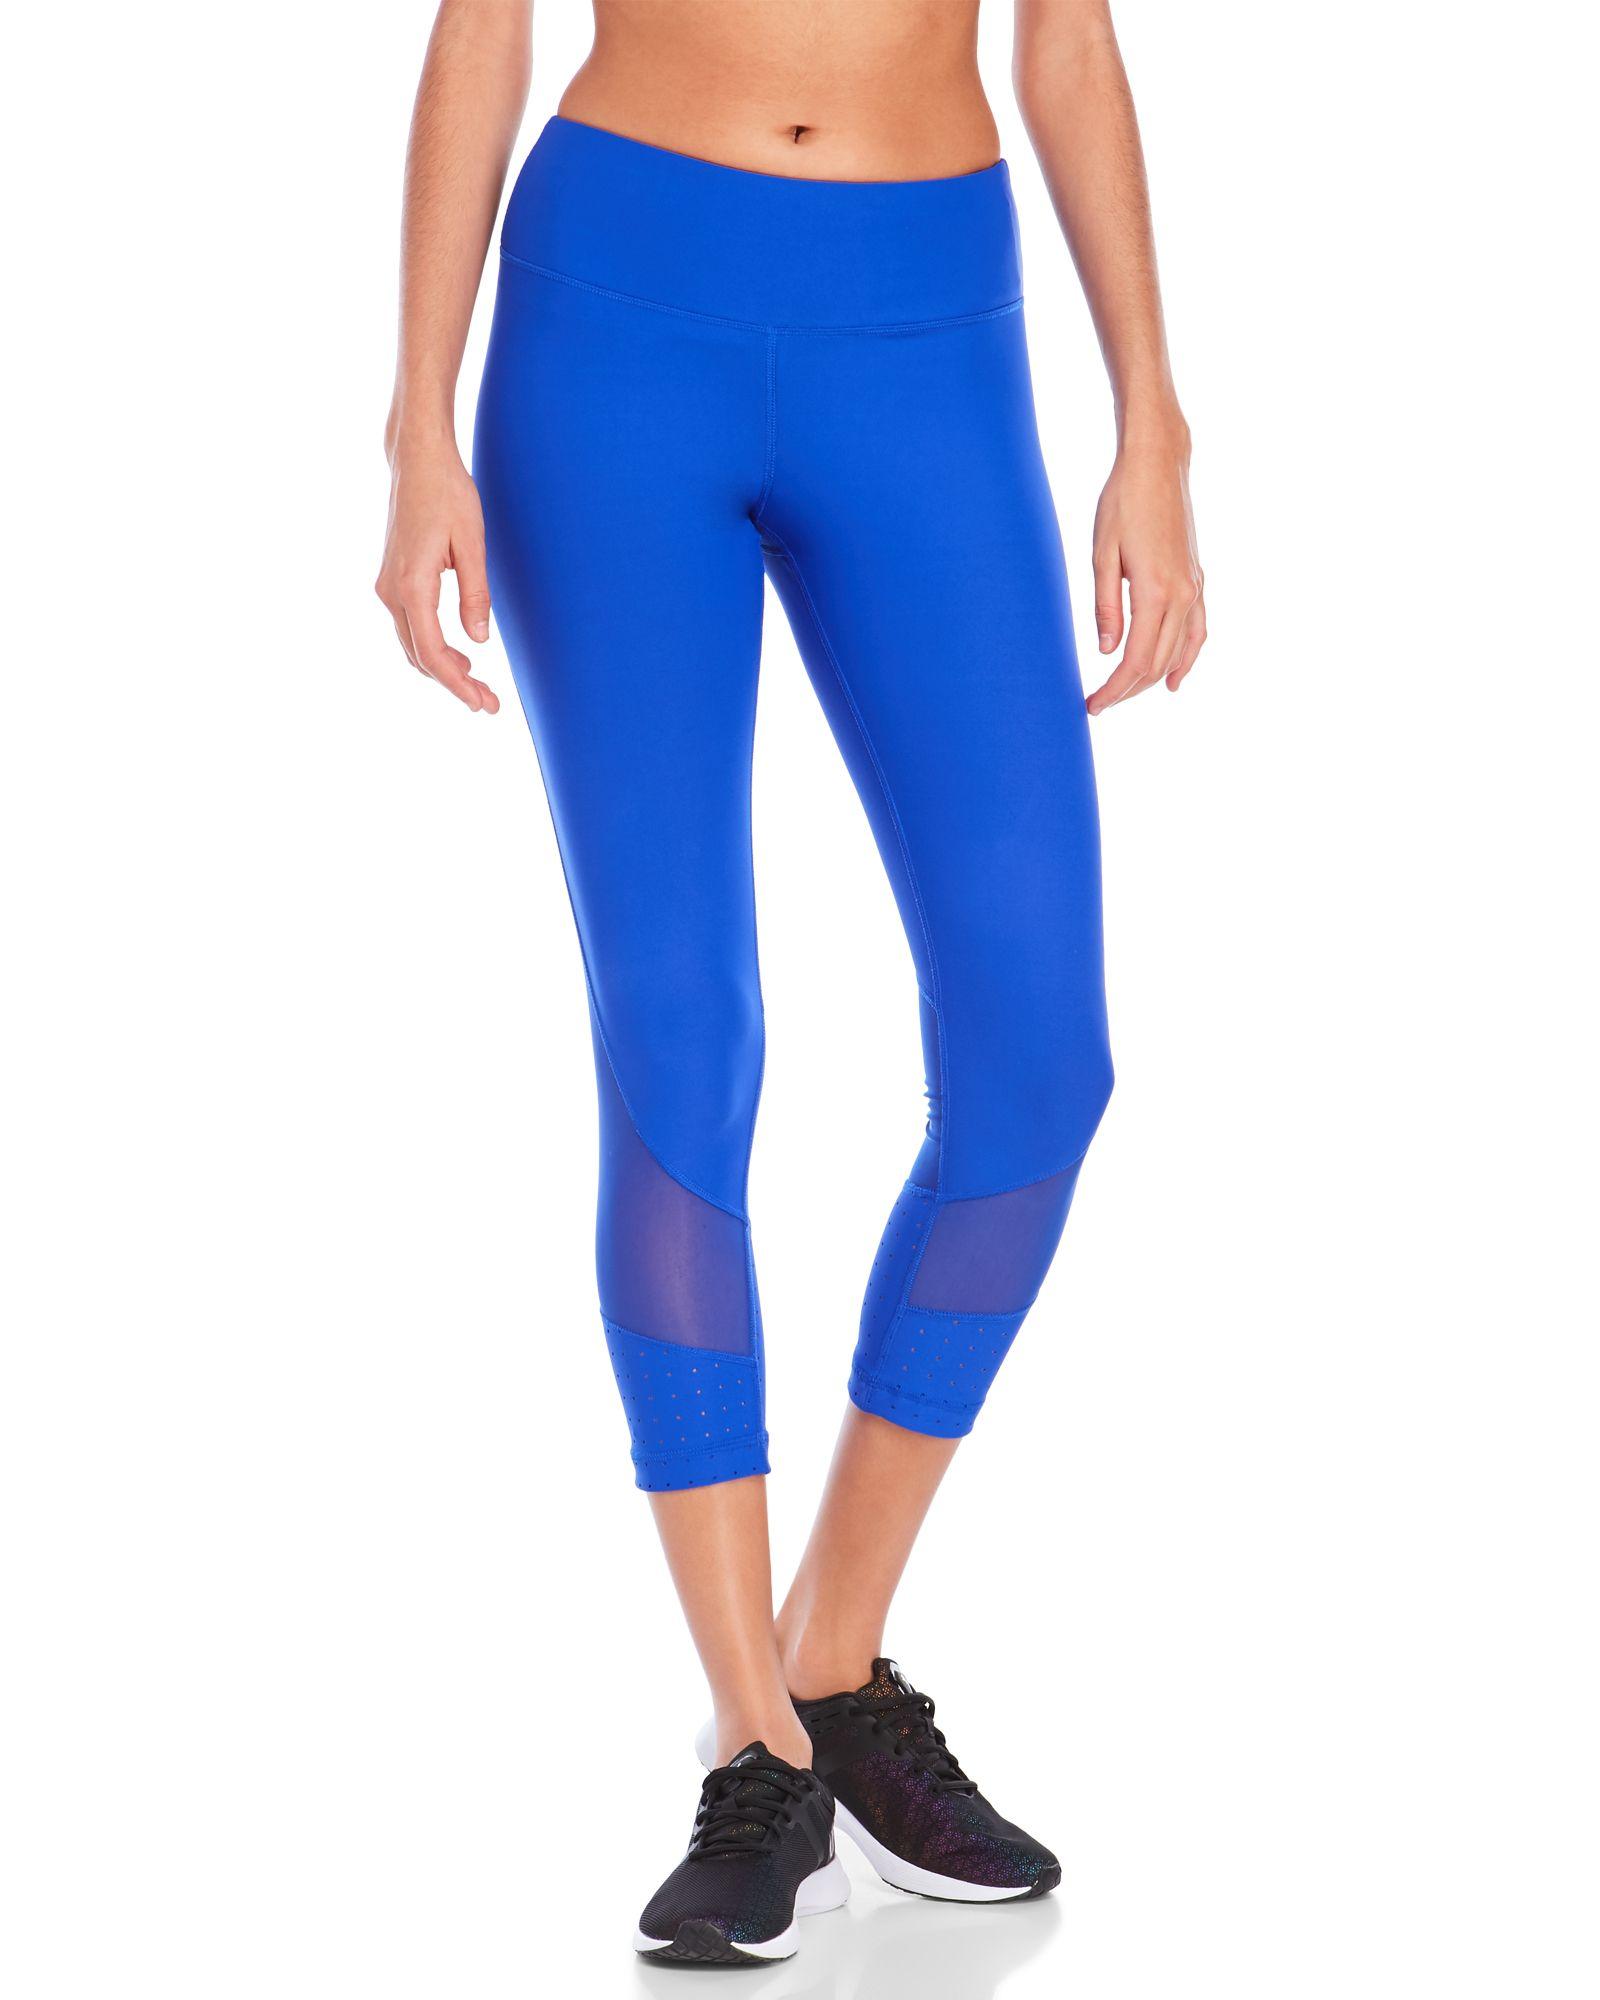 ecd2ccbd0e 90 Degree By Reflex Royal Blue Mesh & Perforations Cropped Leggings